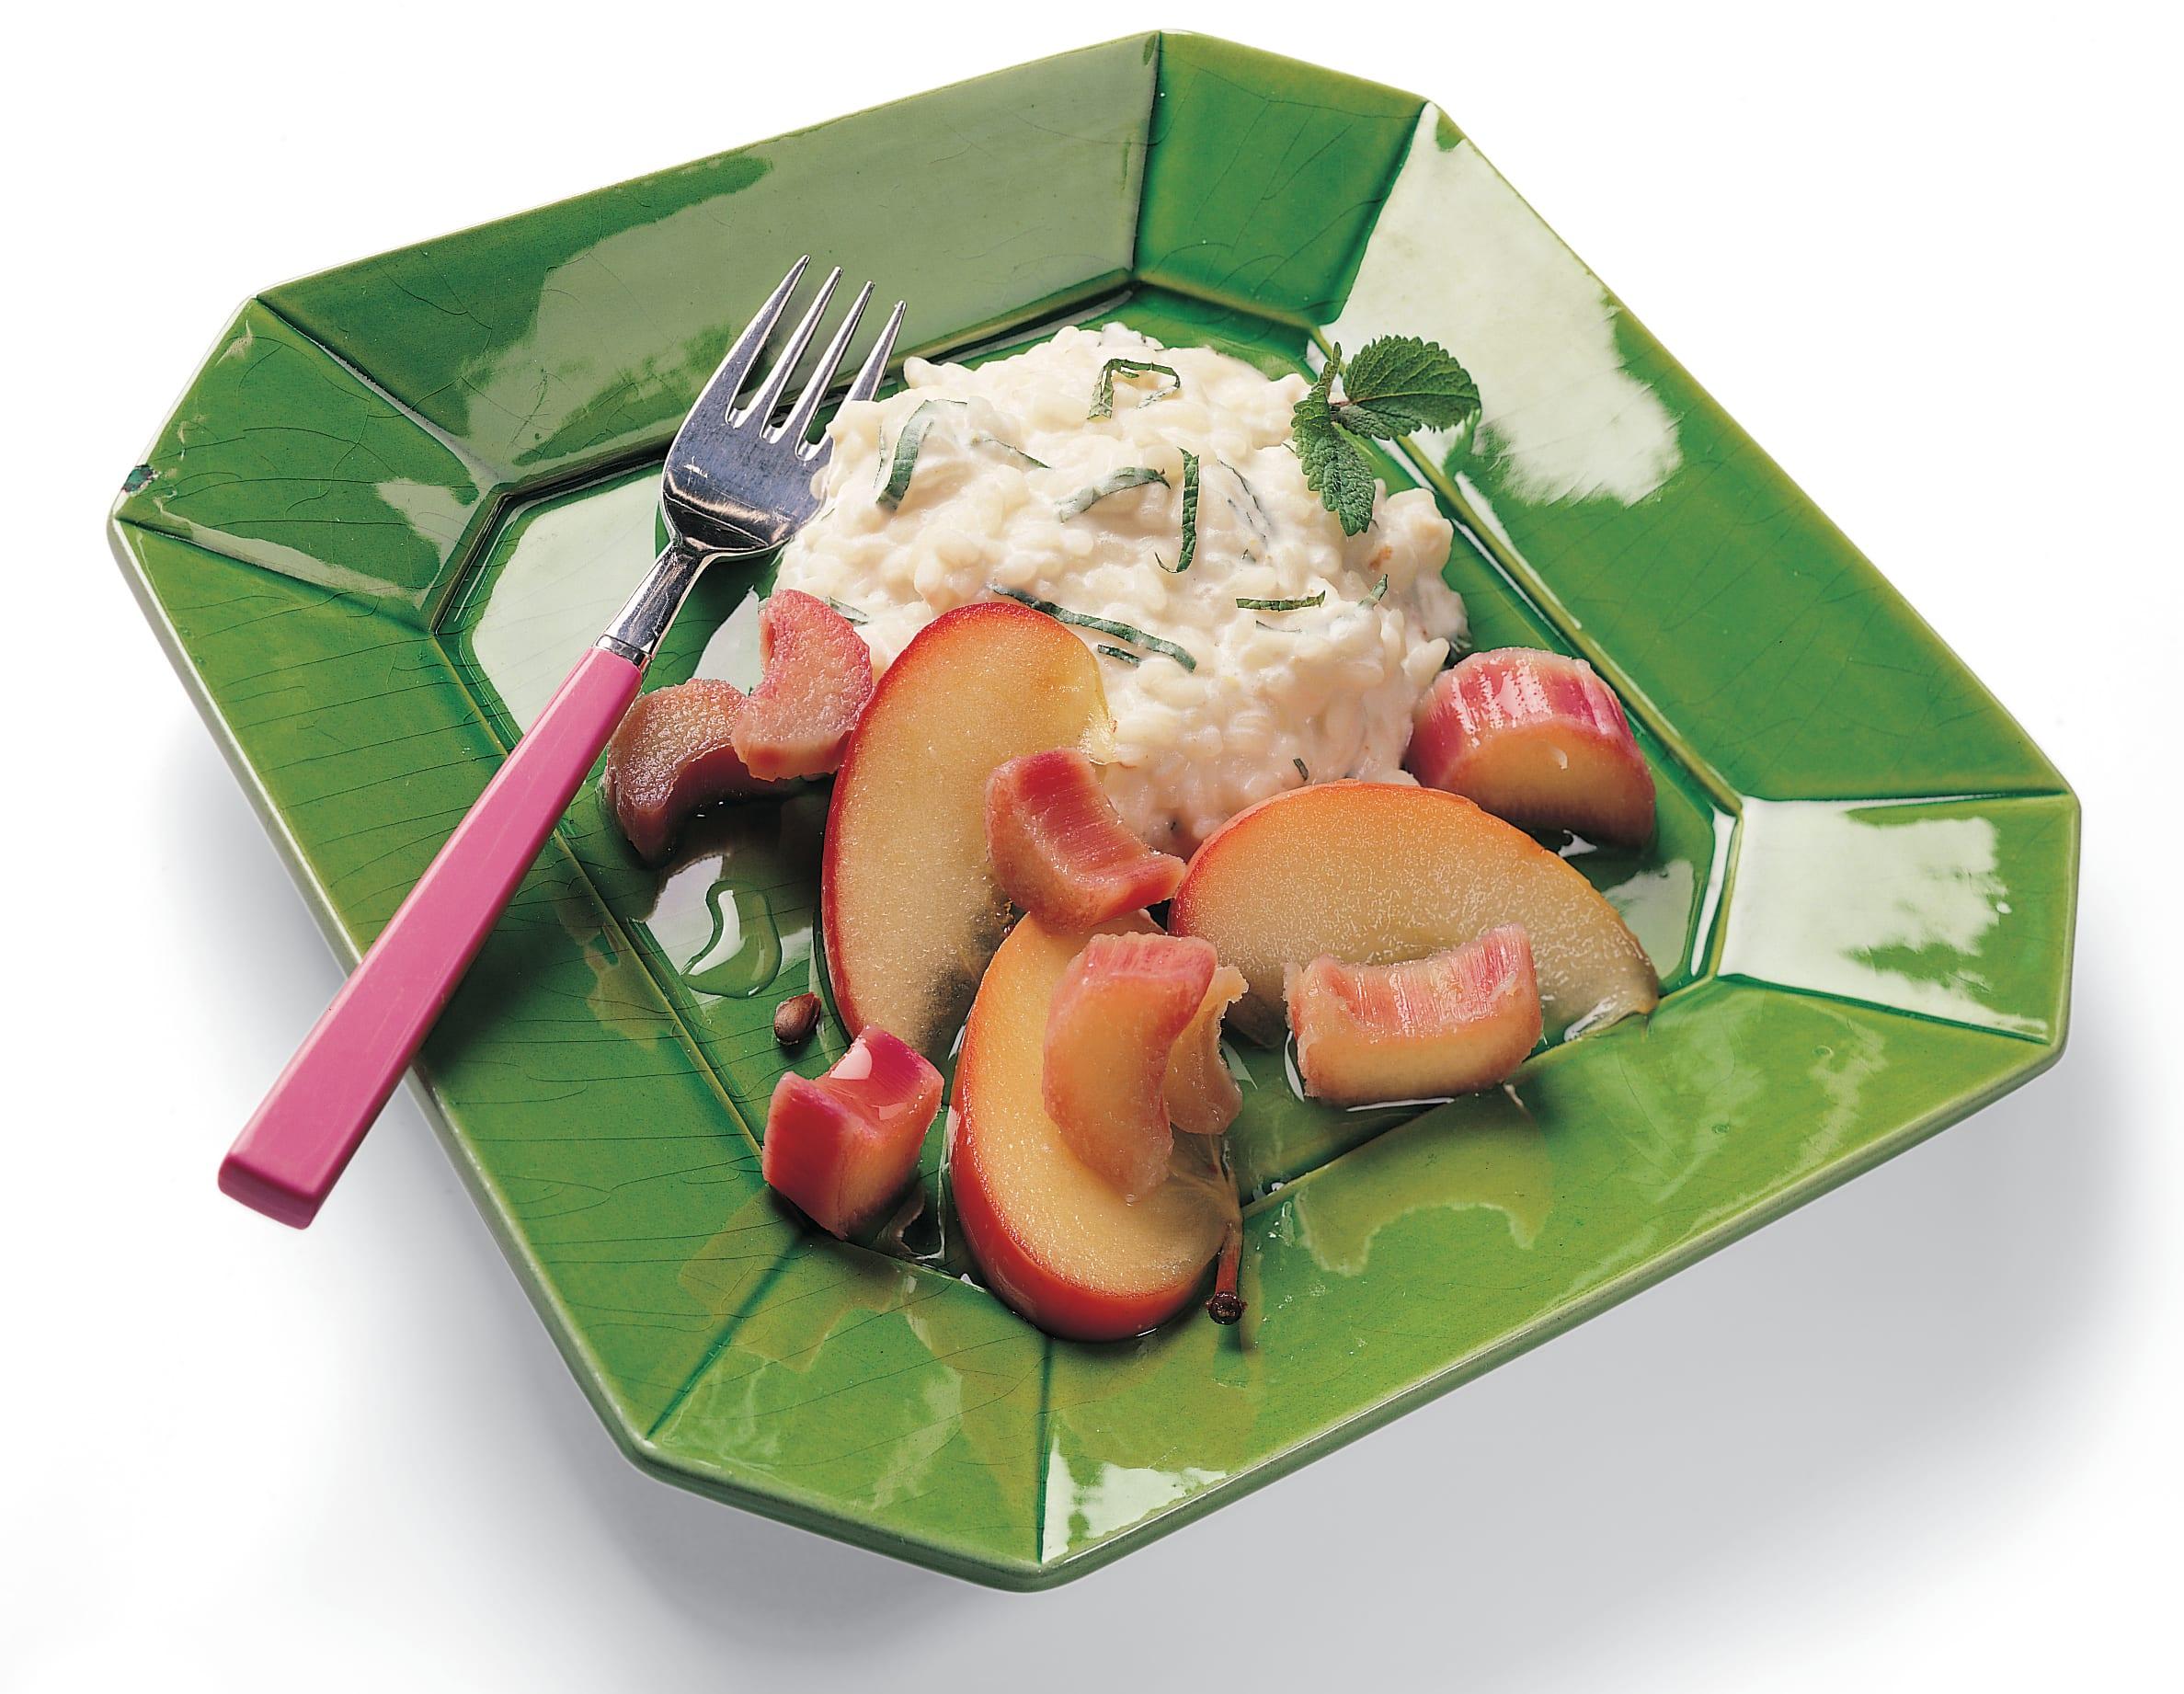 Riz au yogourt et compote pomme-rhubarbe